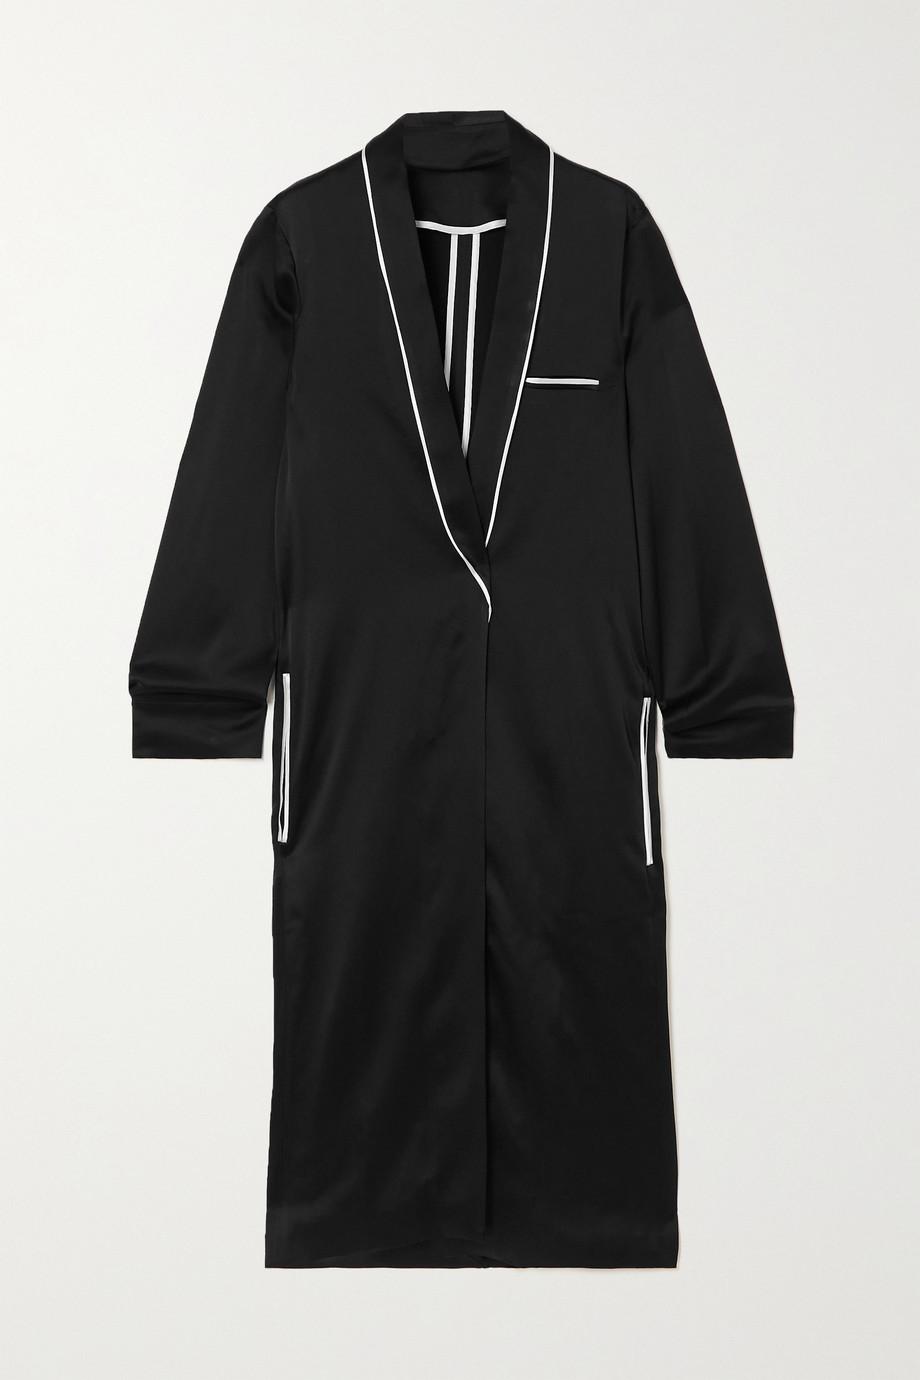 Haider Ackermann Peignoir piped satin-crepe jacket